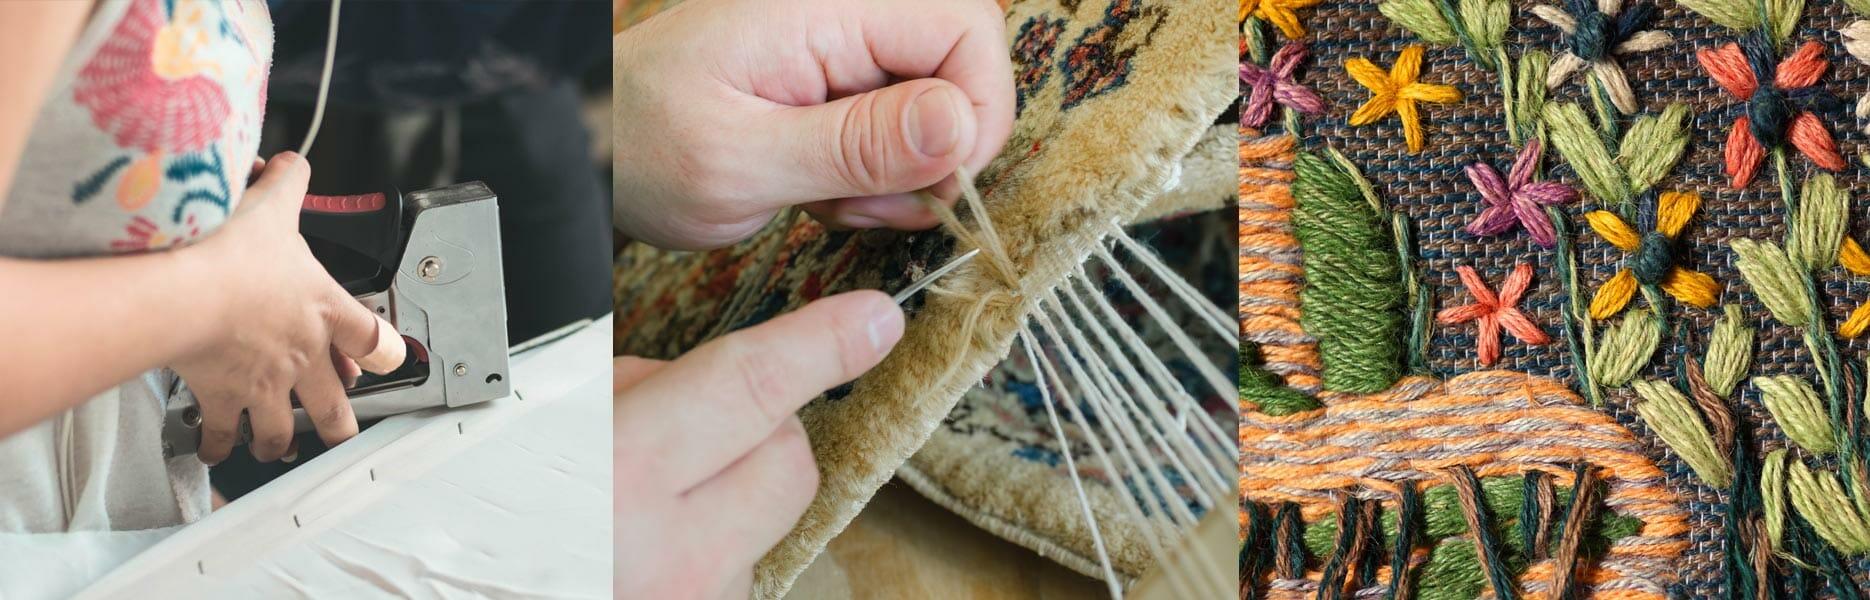 Textile Repair Services